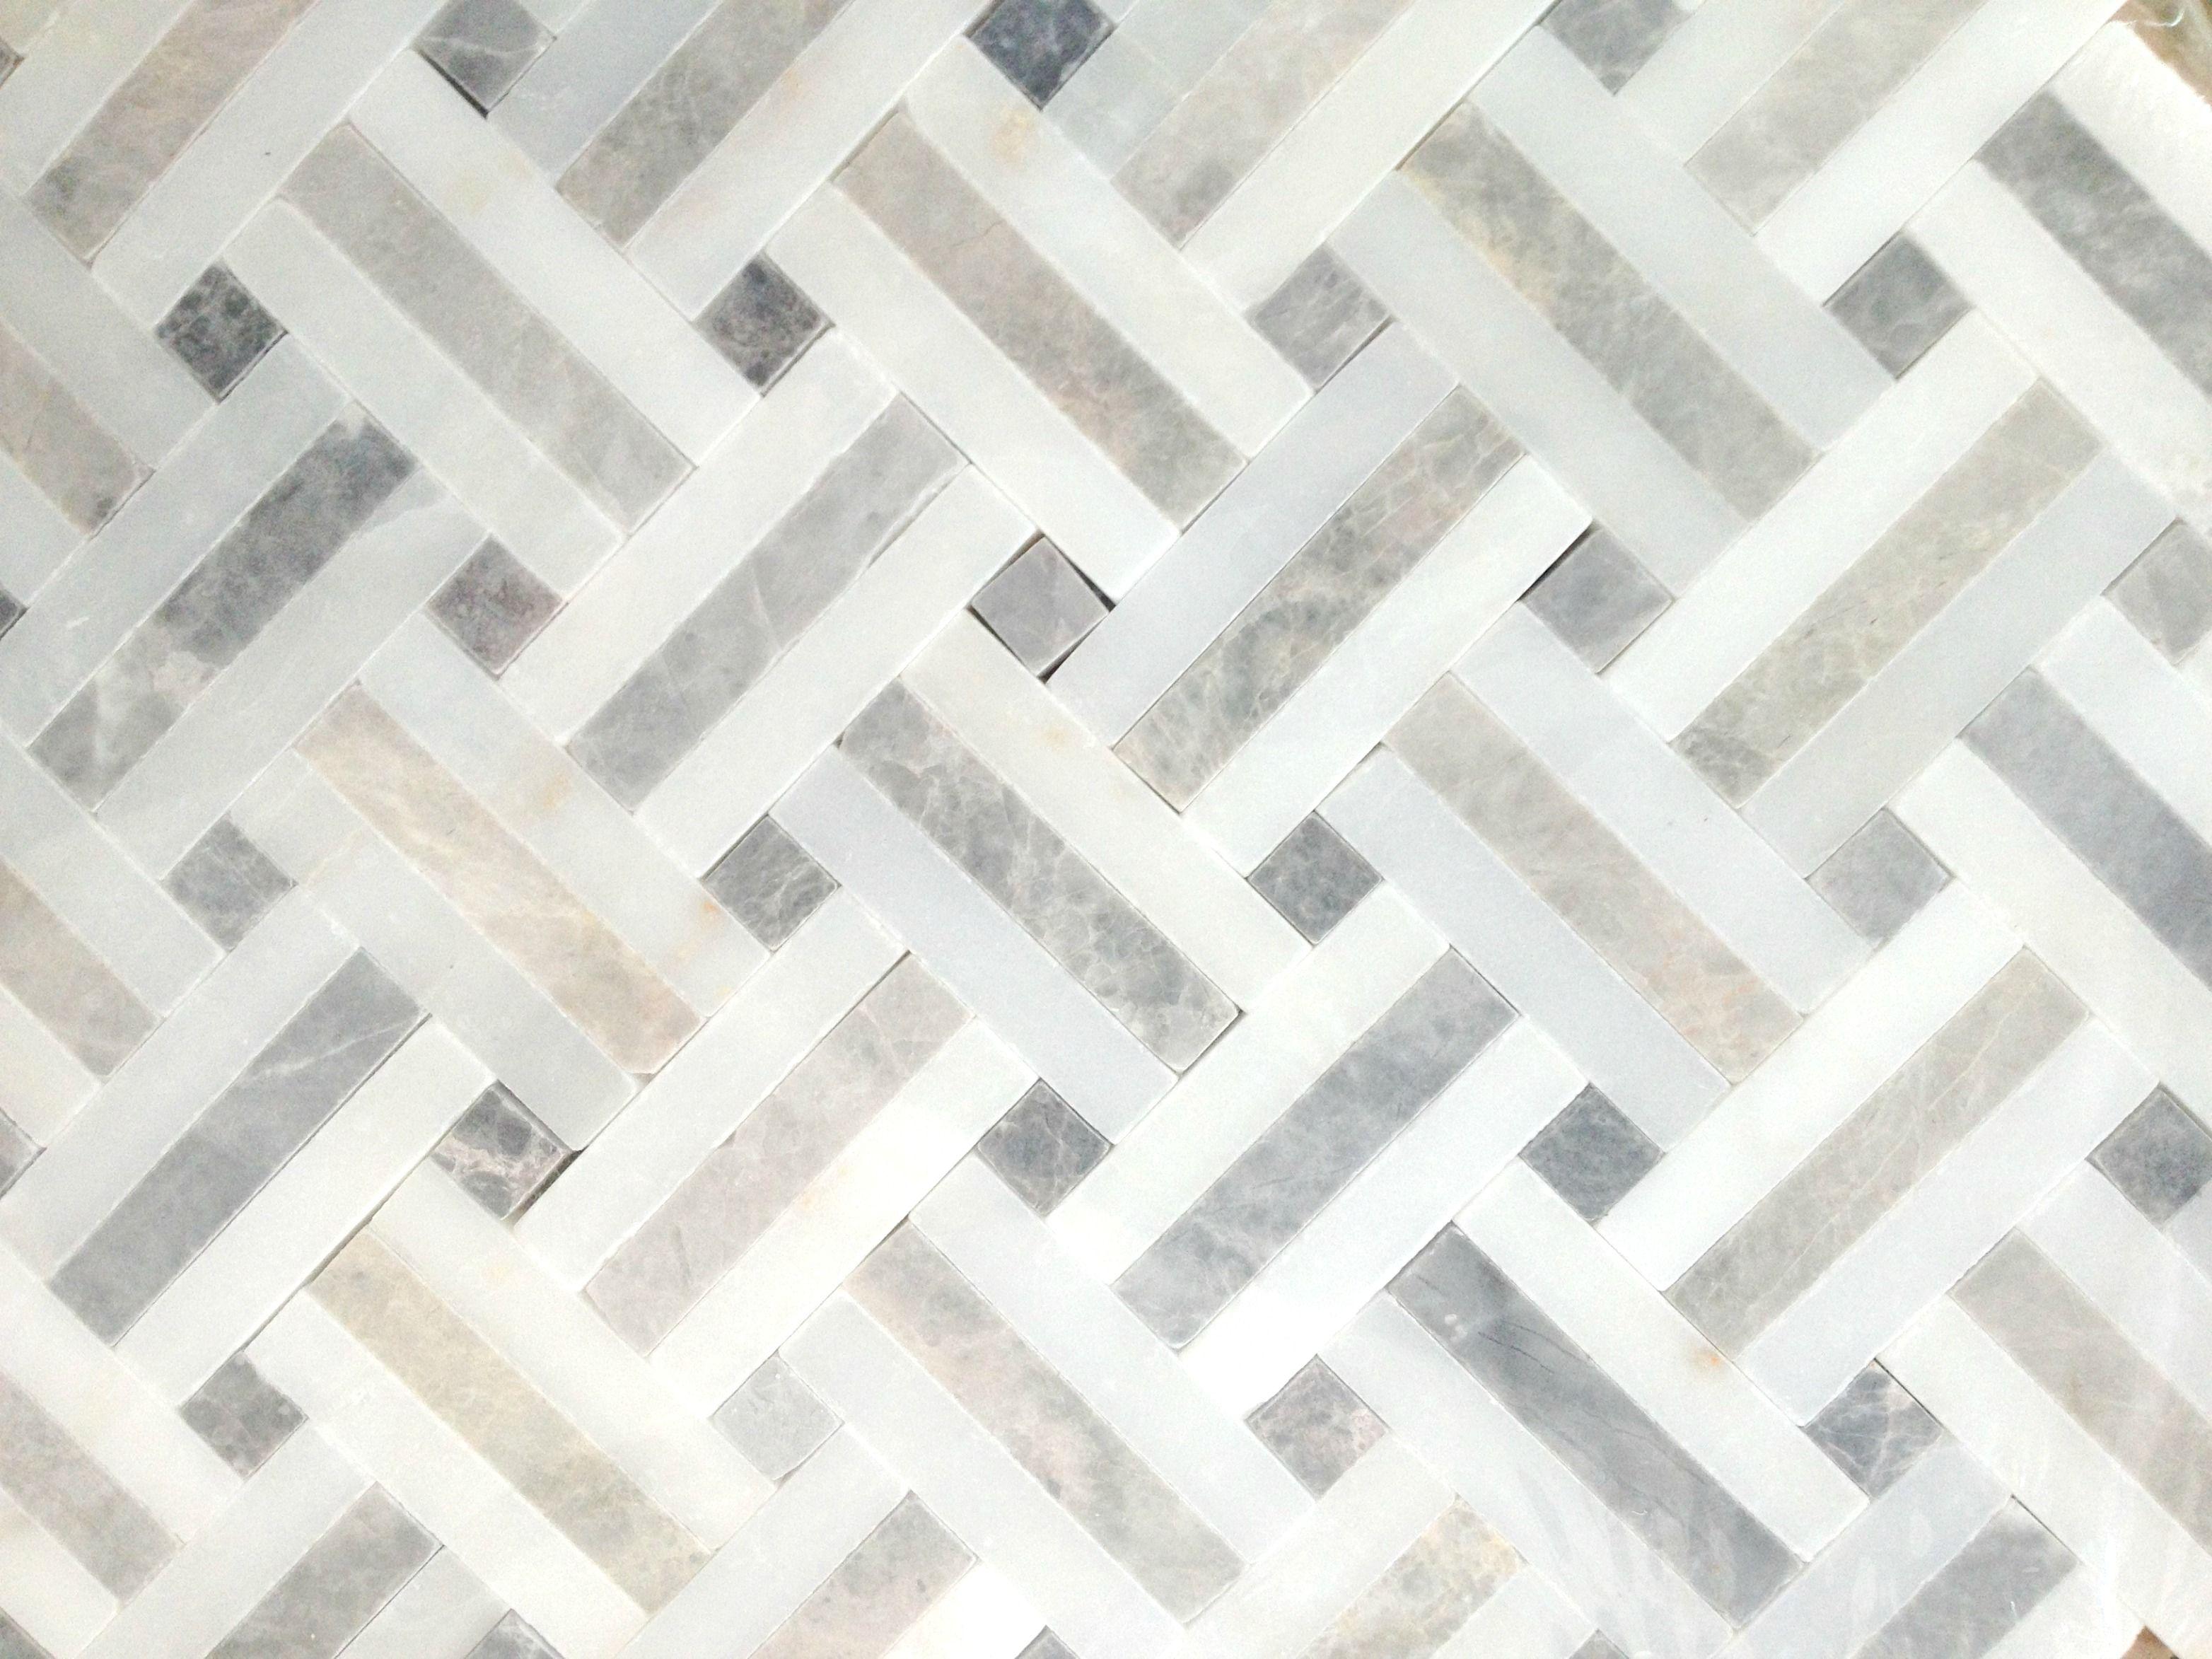 Tile에 대한 이미지 검색결과 02 Material And Texture 건축 프리젠테이션